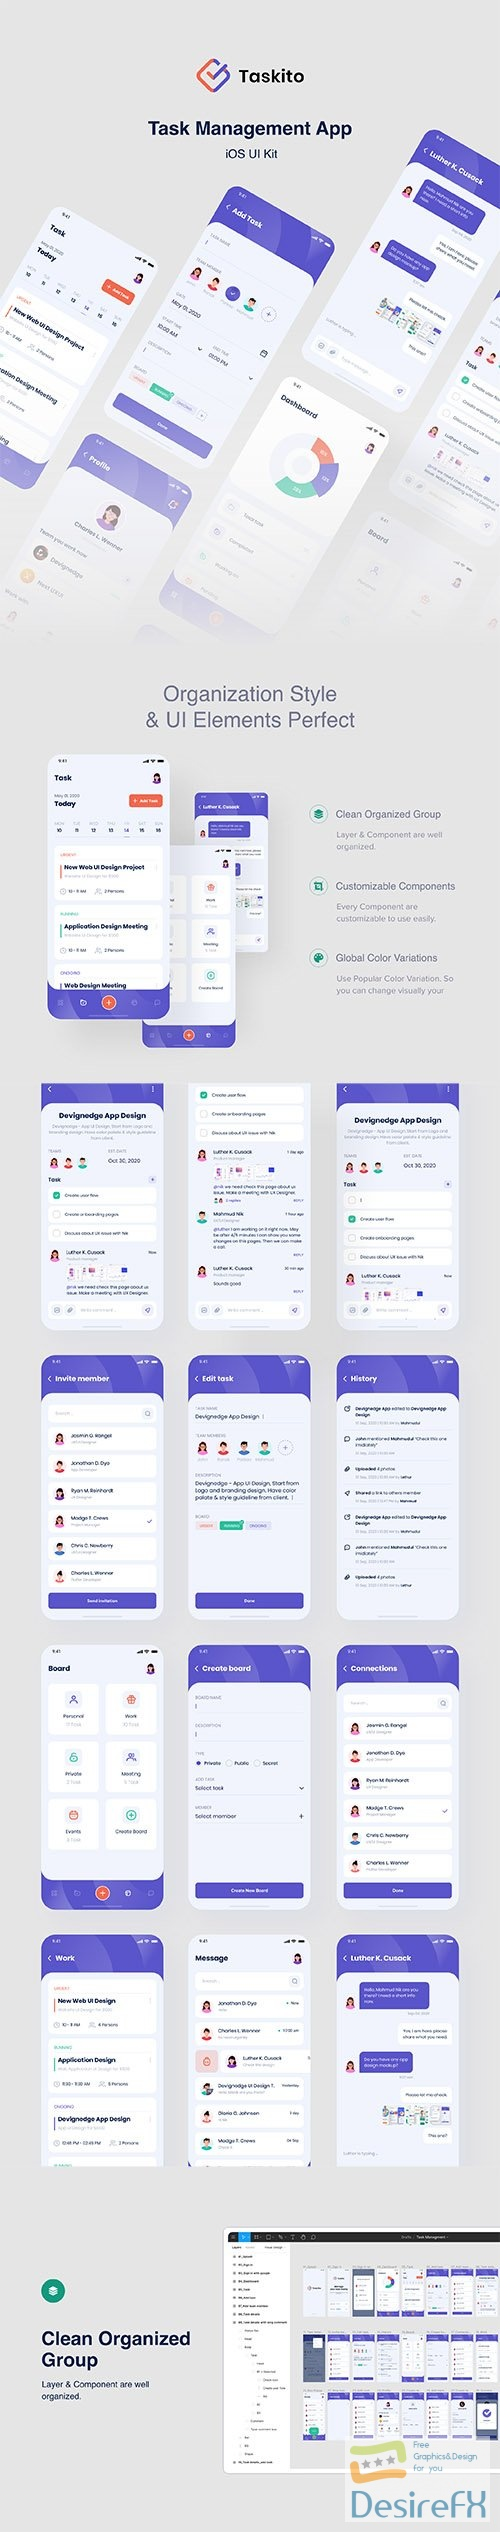 Taskito - Task Management App UI Kit - UI8